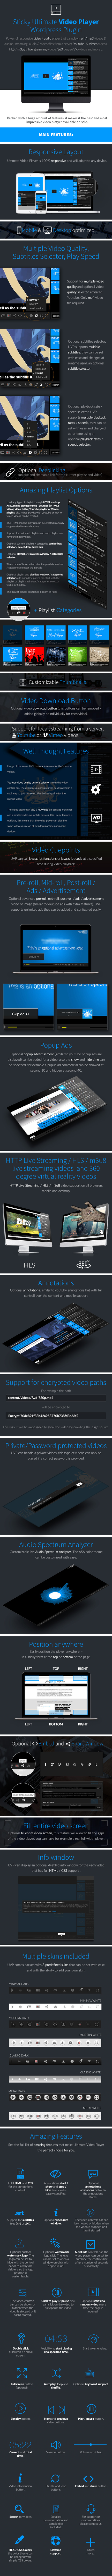 - SUVPWP - Sticky Ultimate Video Player Wordpress Plugin